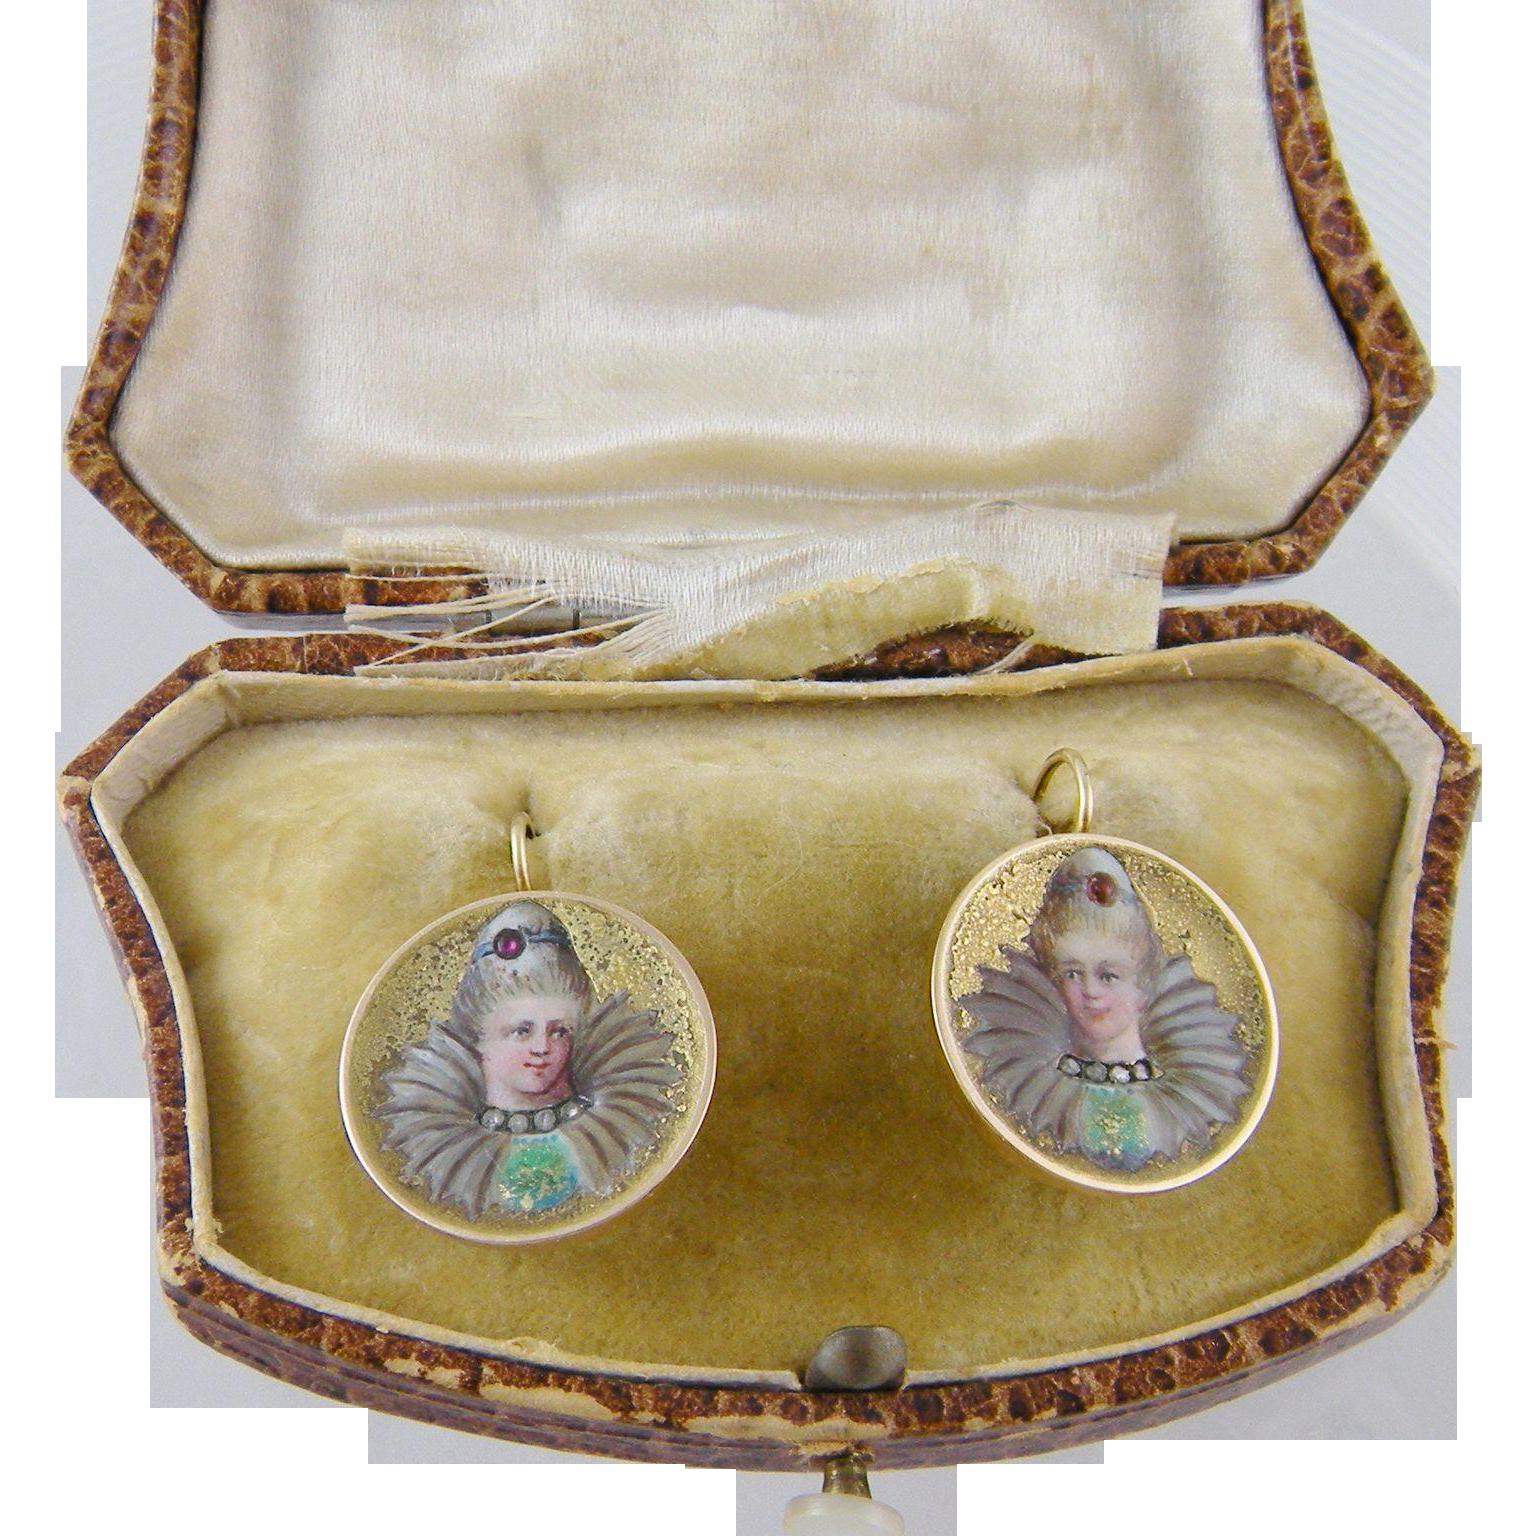 Rare Superb Antique Art Nouveau 14 Kt Gold with Diamonds and Rubies  ENAMEL WOMEN   EARRINGS